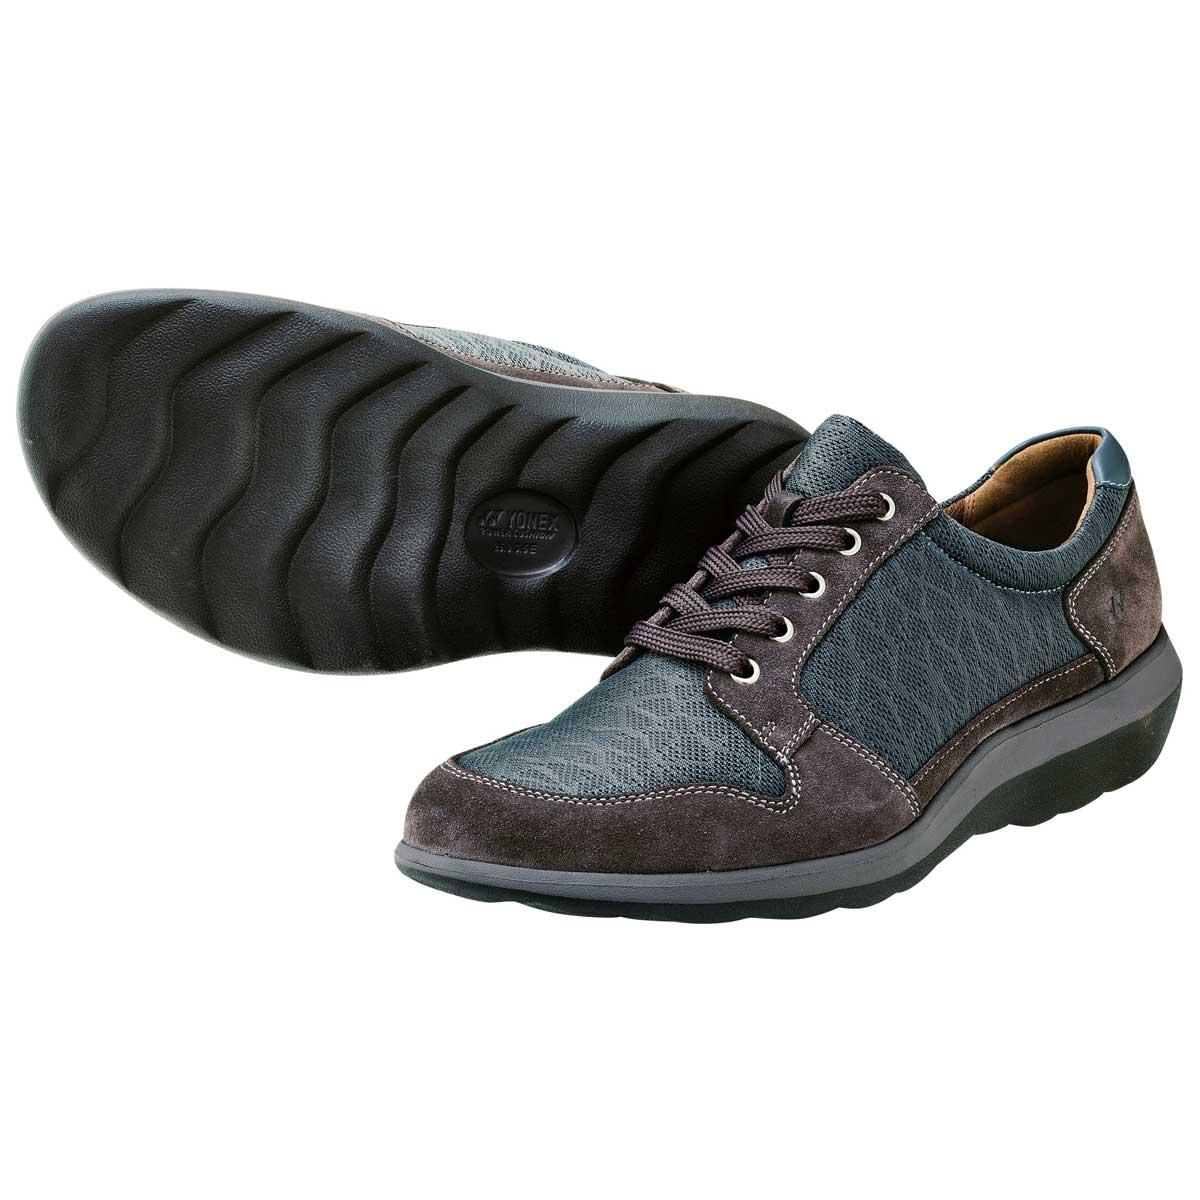 YONEX ヨネックス MC88 グレー (メンズ)軽い疲れにくいウォーキングシューズ「靴」